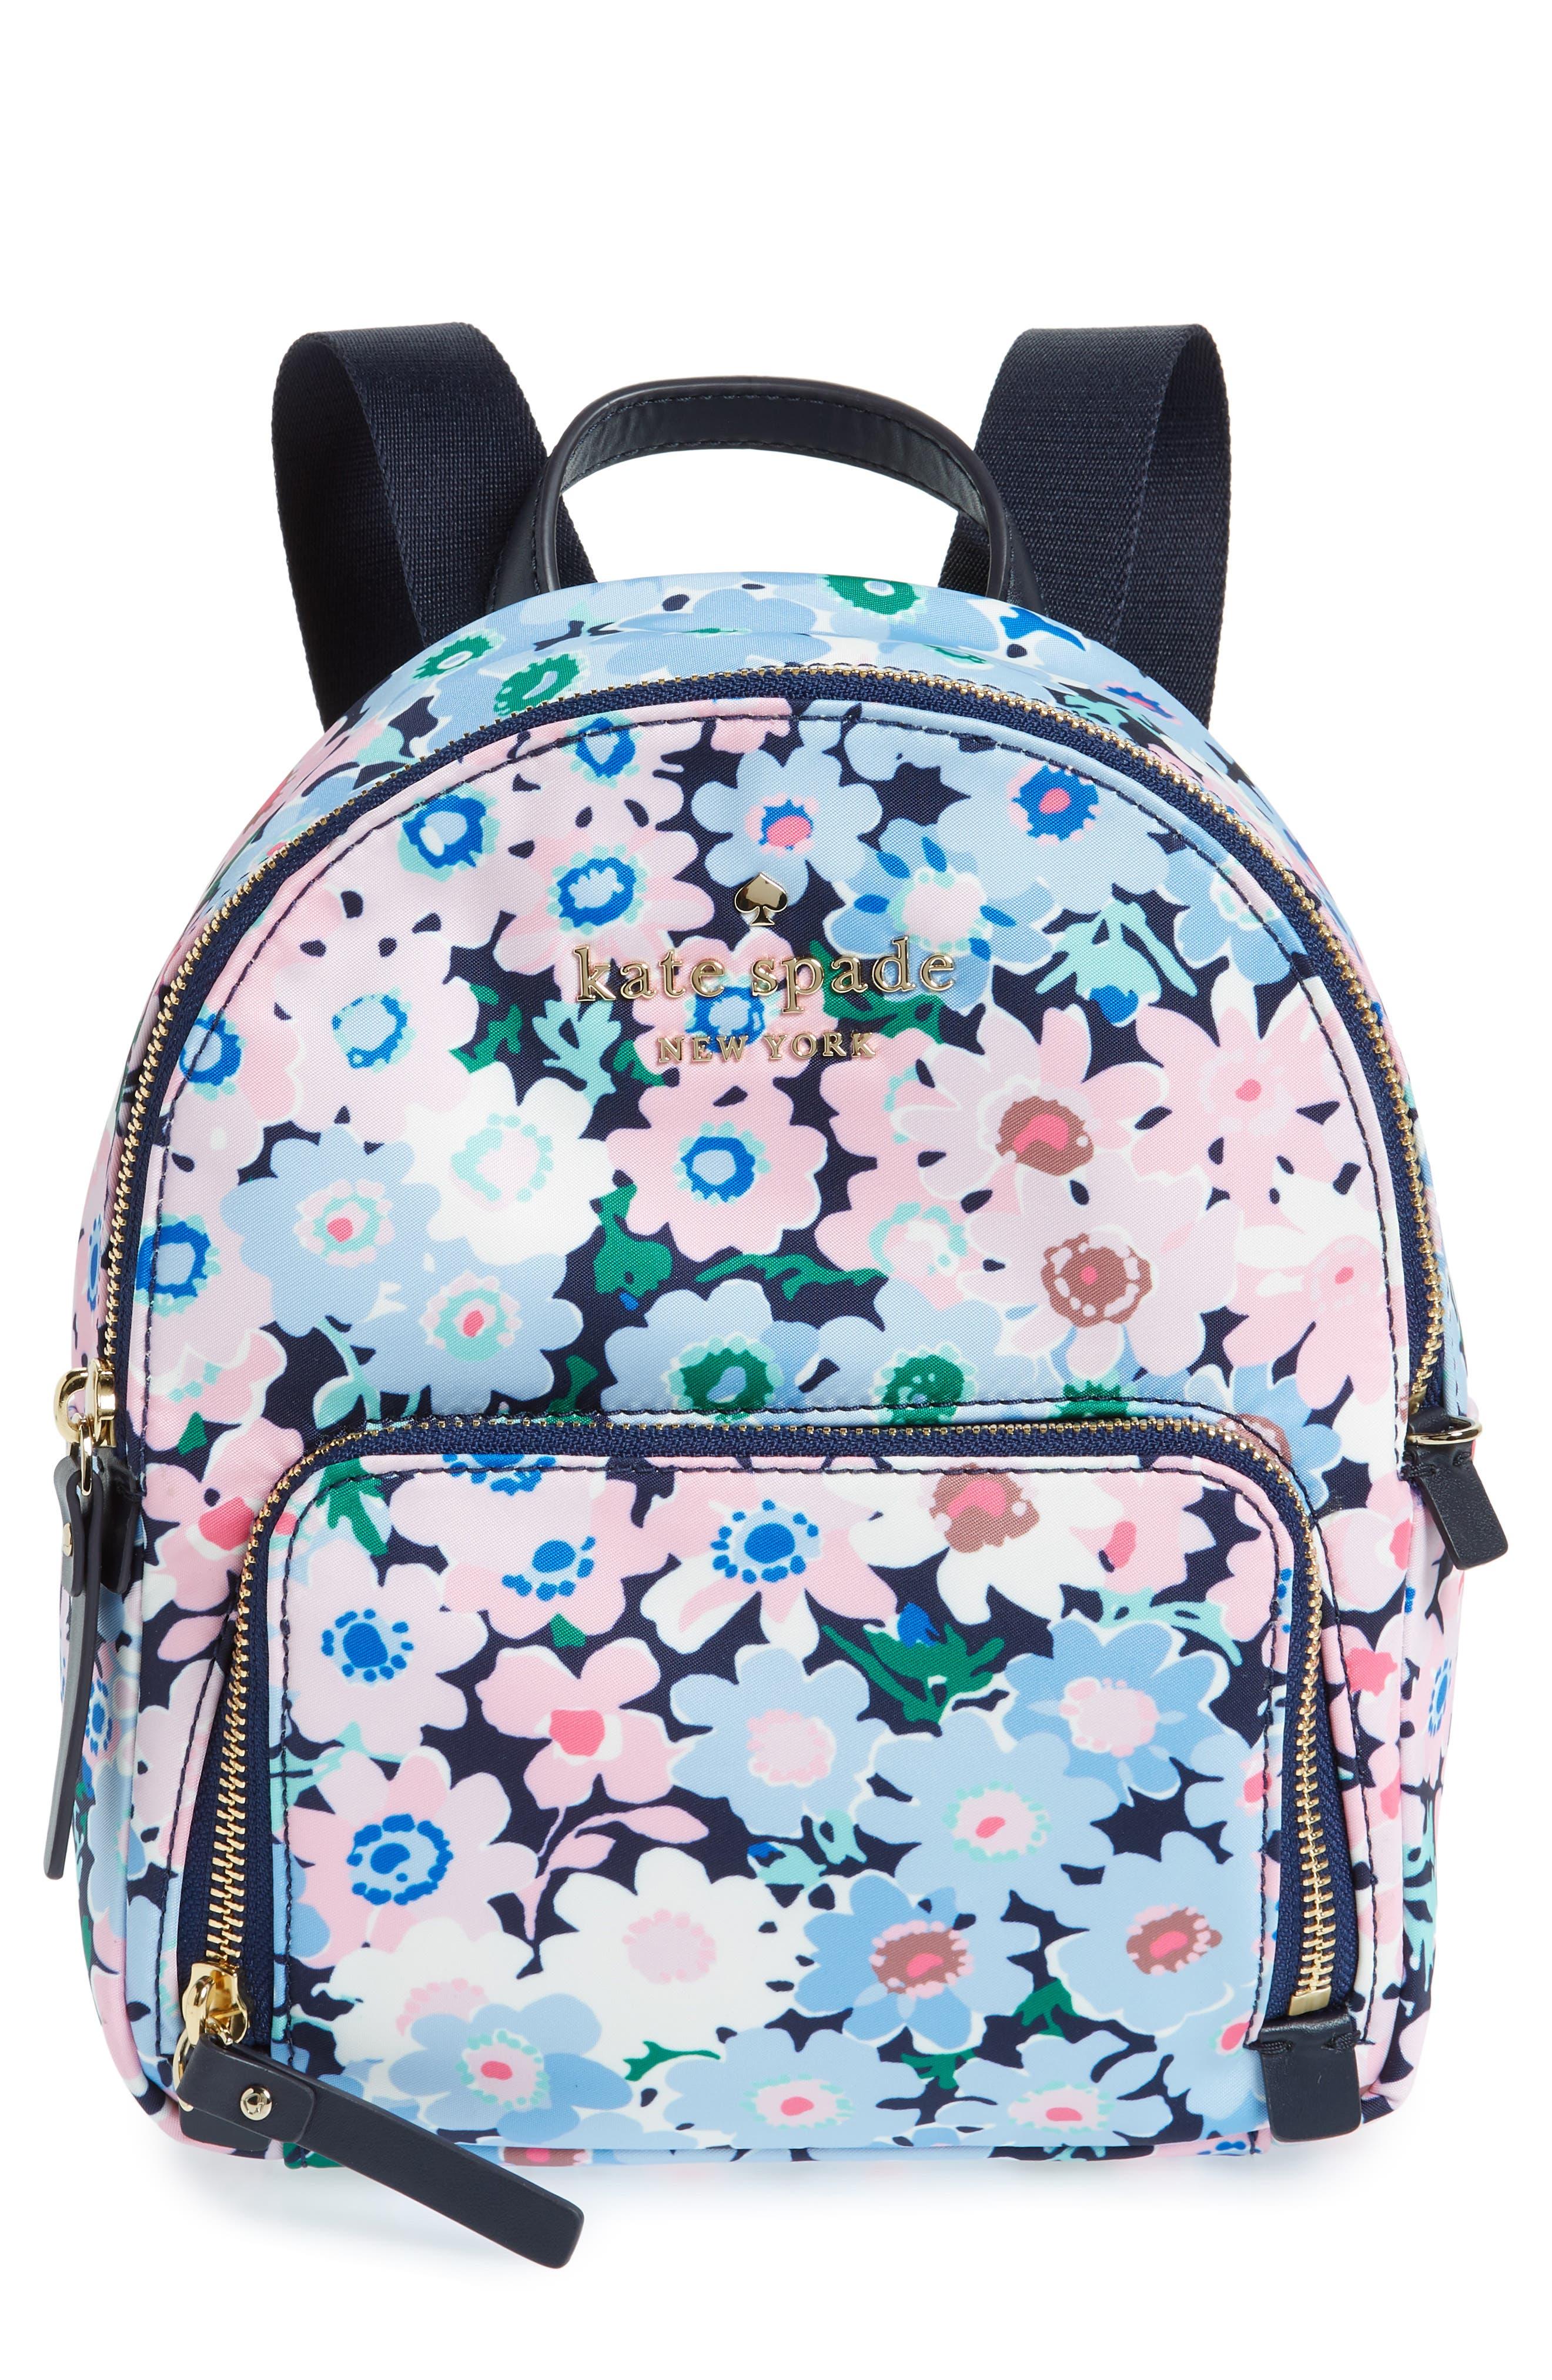 kate spade new york watson lane - daisy garden small hartley backpack